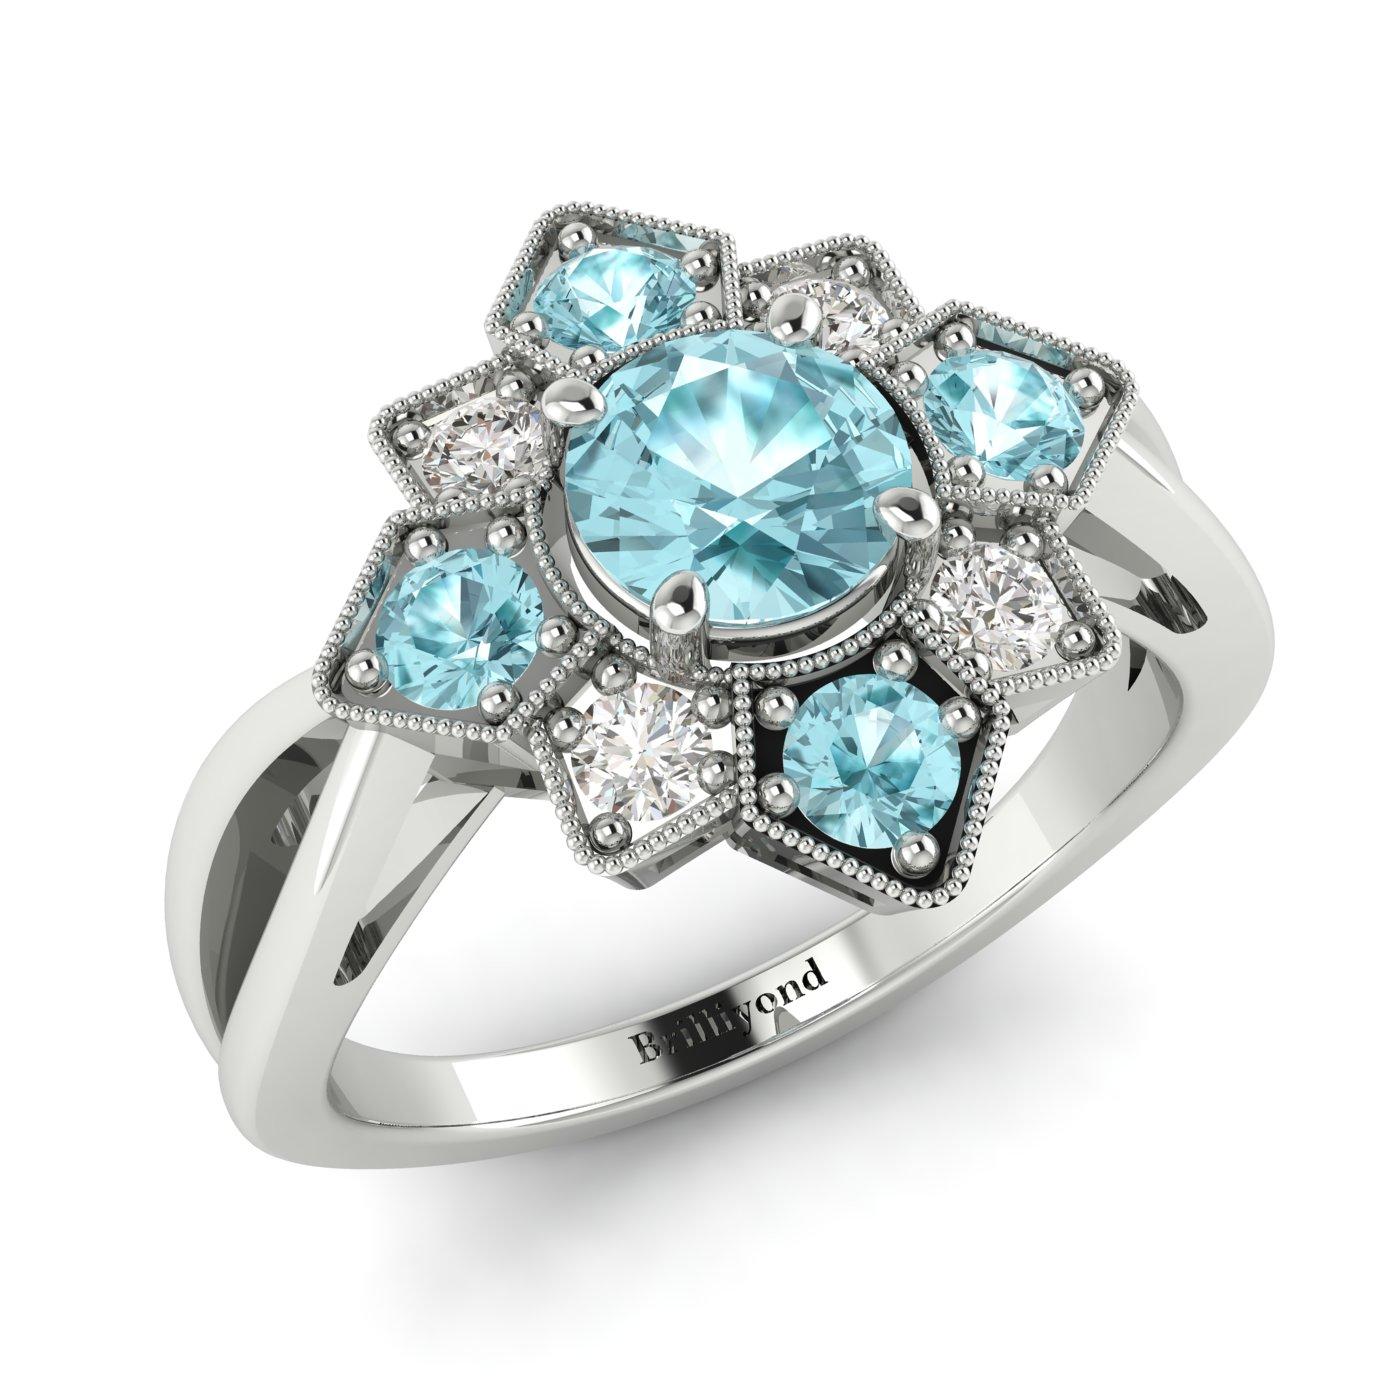 Aquamarine White Gold Cluster Engagement Ring Madonna_image2